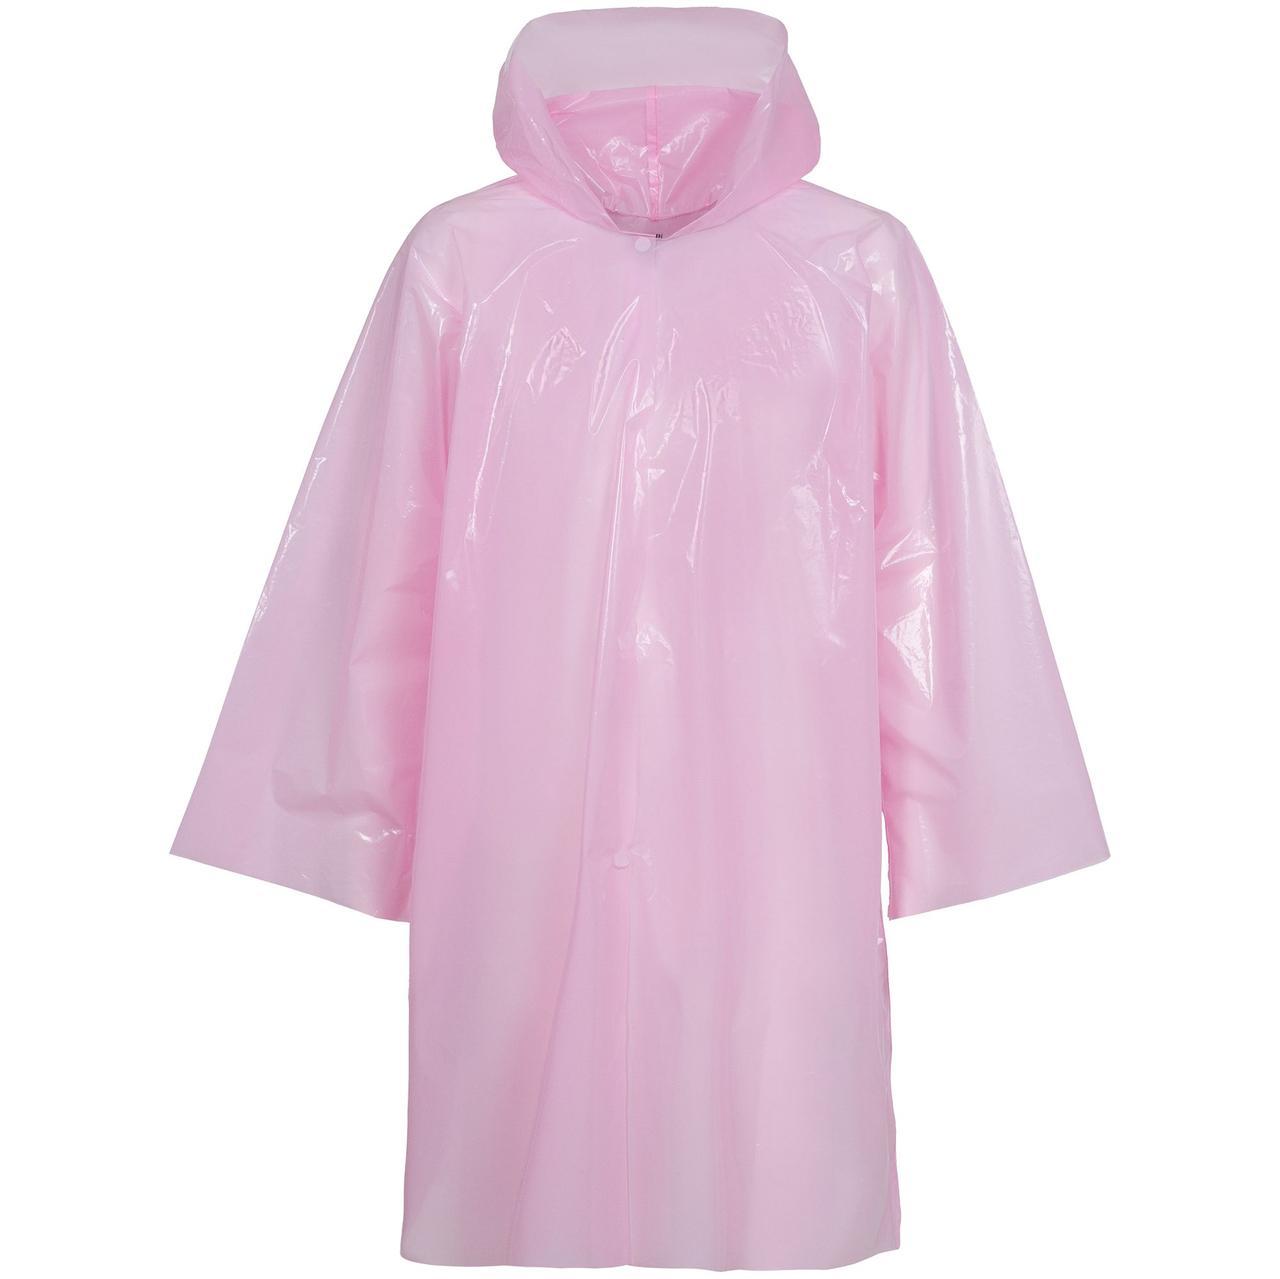 Дождевик-плащ CloudTime, розовый (артикул 11876.15)